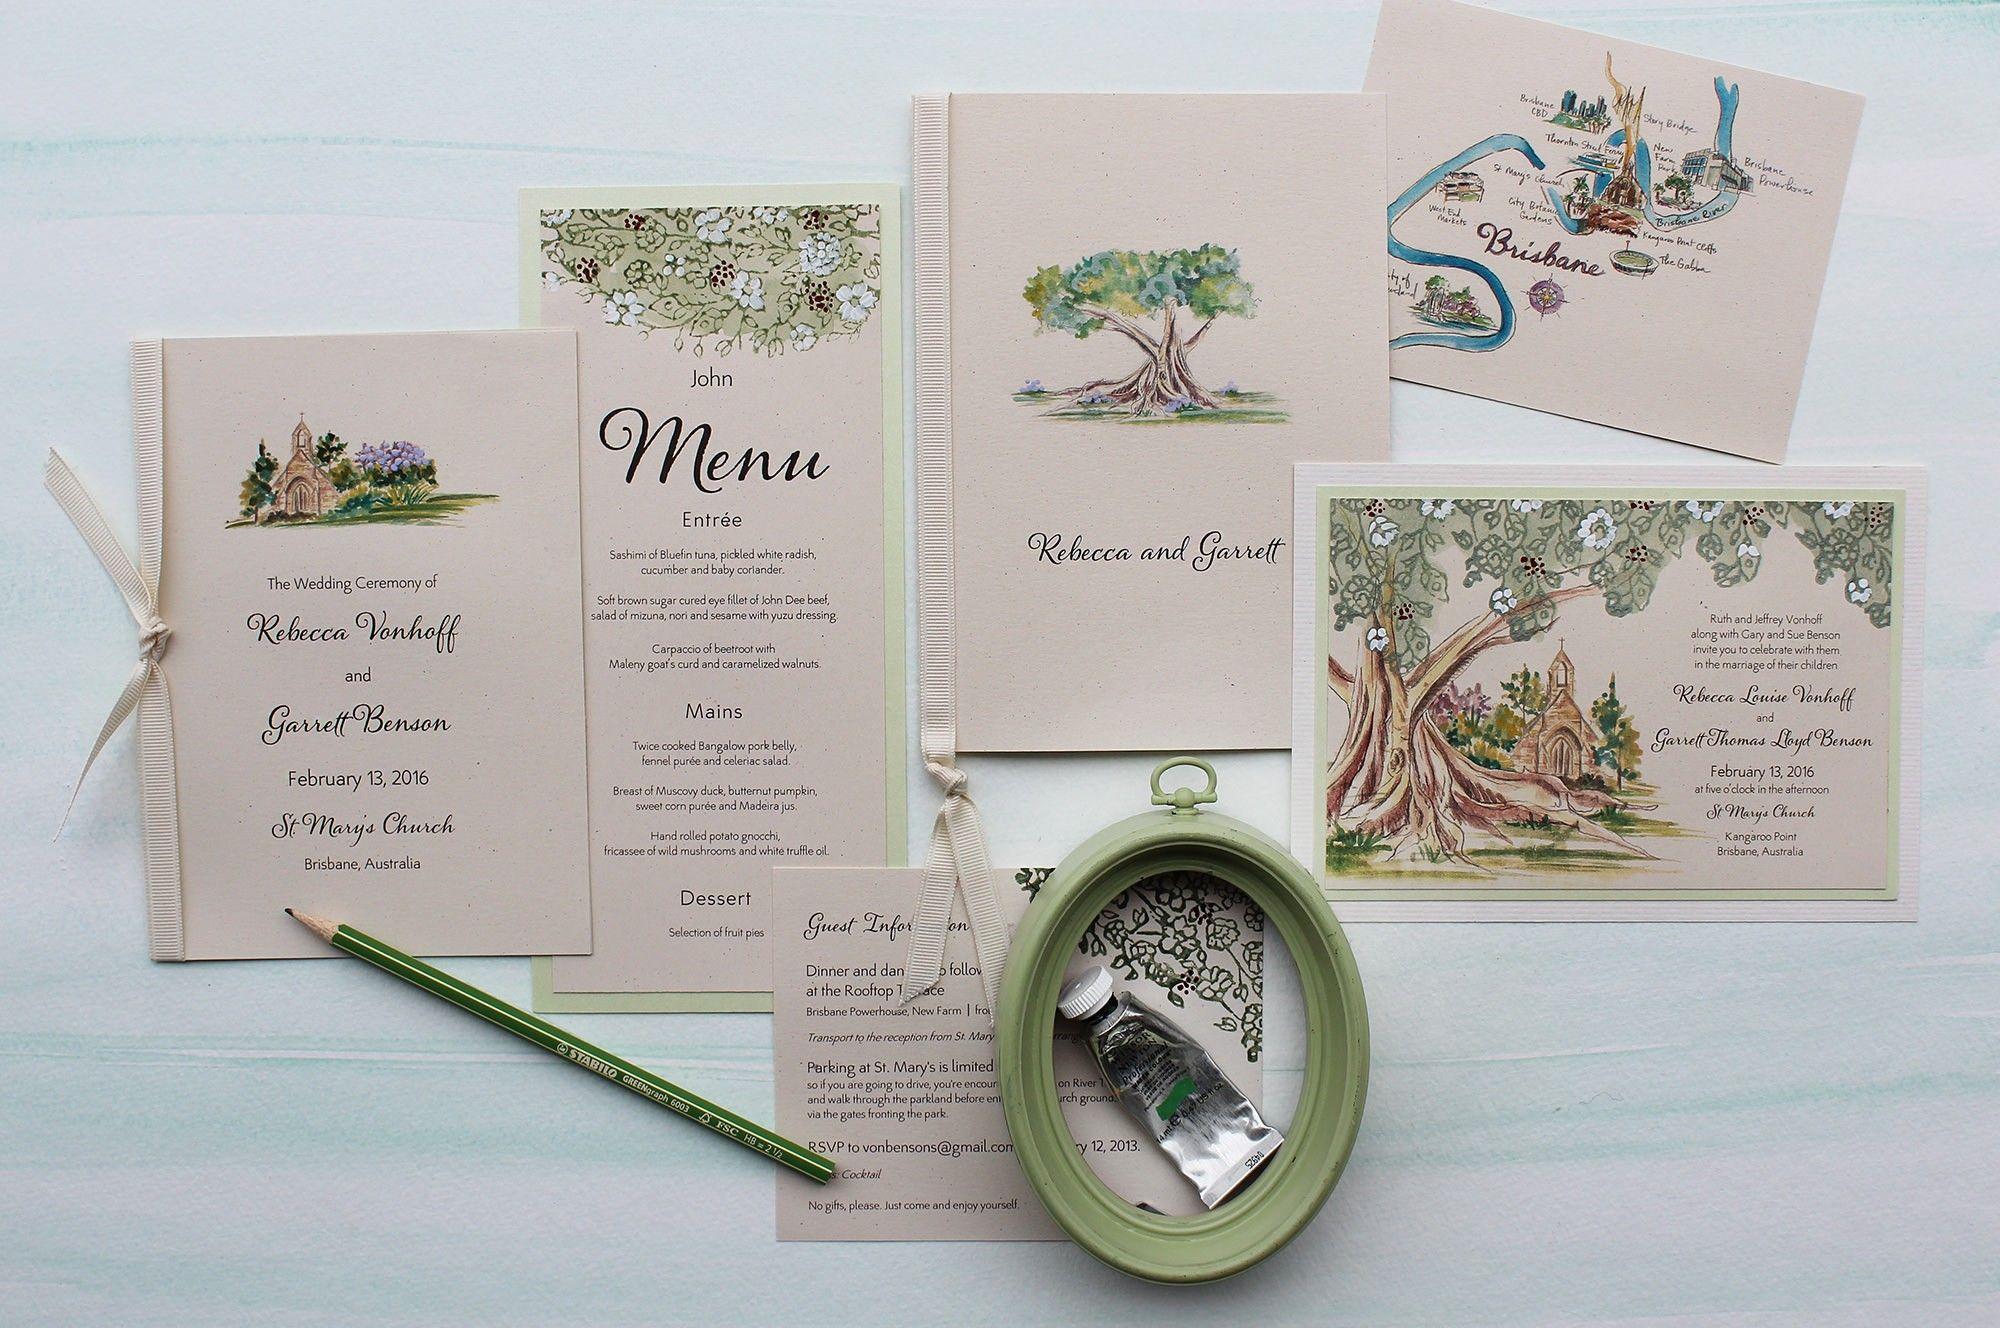 Watercolor Tree Wedding Invitations | Church weddings, Weddings and ...